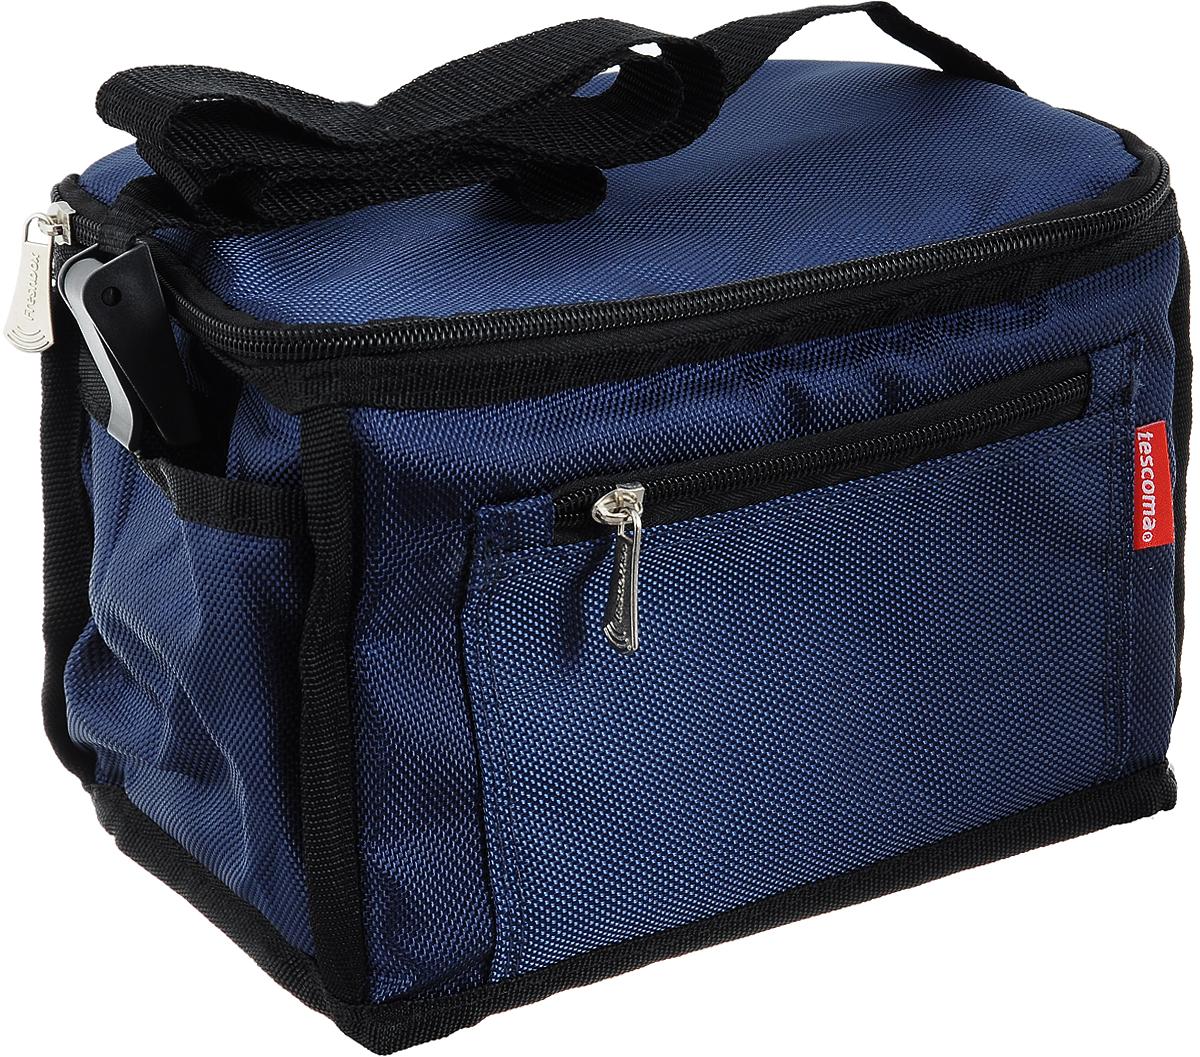 "Термосумка Tescoma ""Freshbox"", цвет: синий, черный, 24,5 х 16,5 х 15 см"